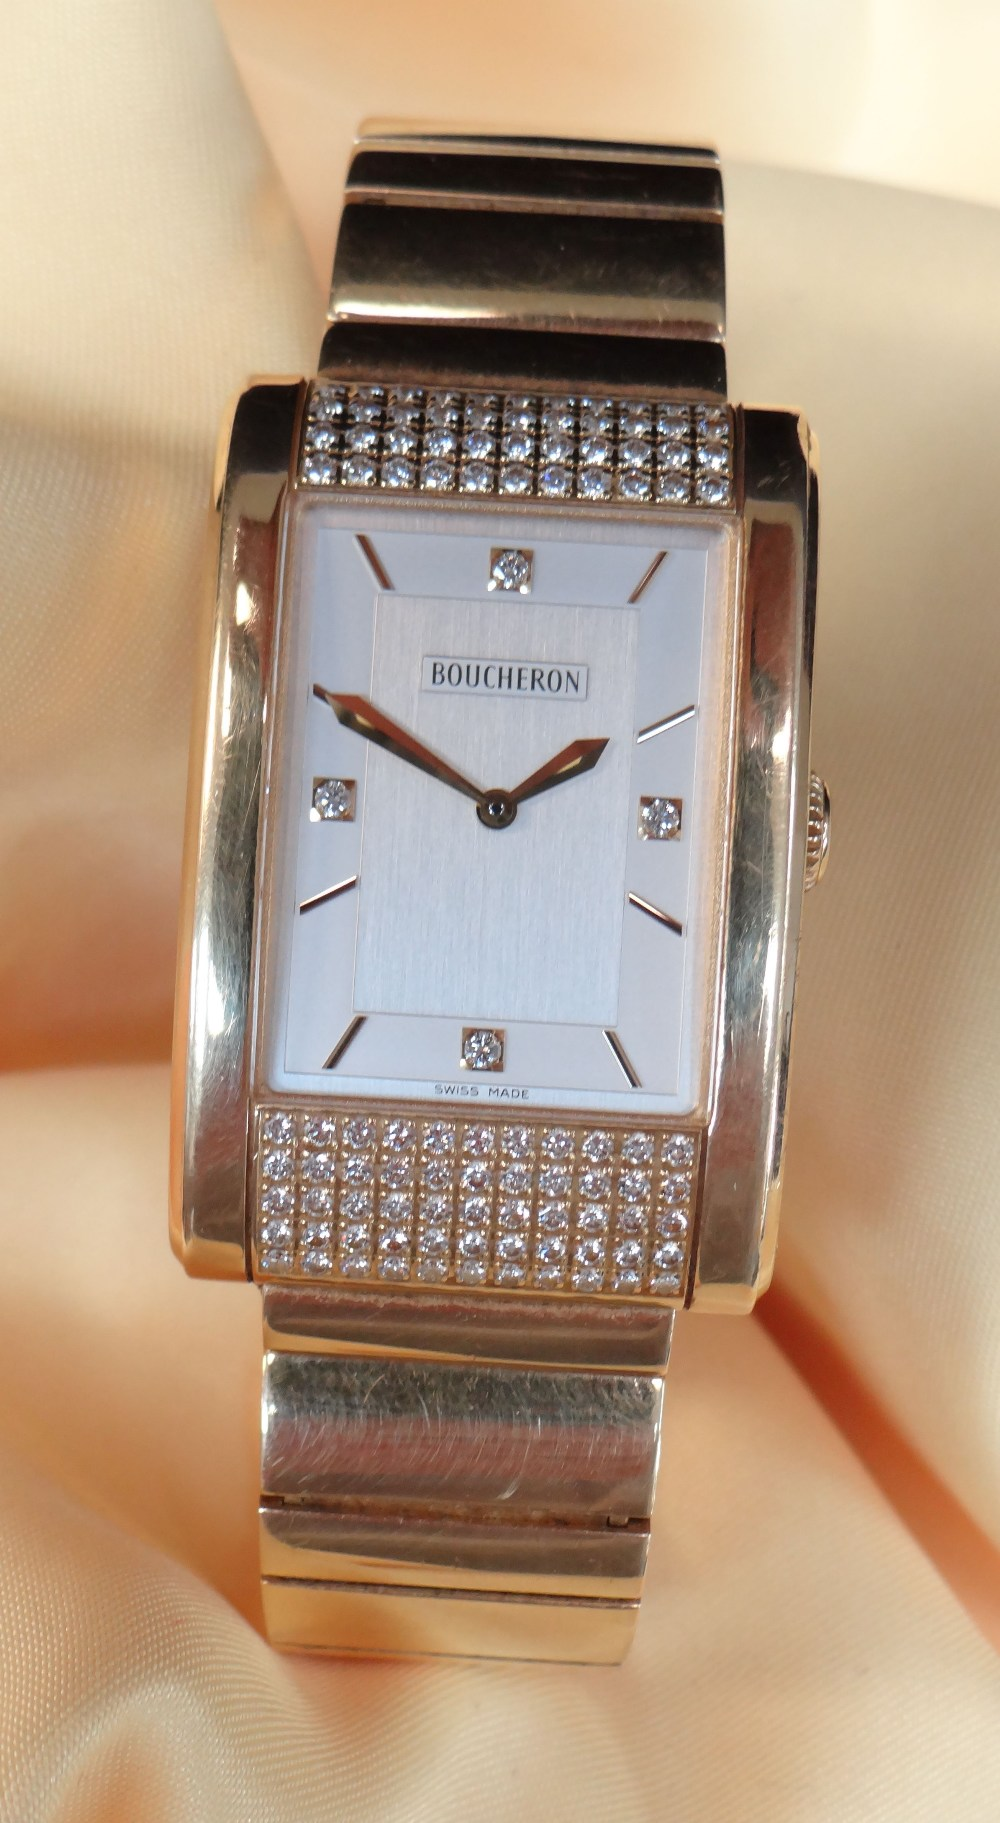 BOUCHERON 18K GOLD & DIAMOND GENTLEMAN'S 'REFLET' BRACELET WATCH, the signed, rectangular two-tone